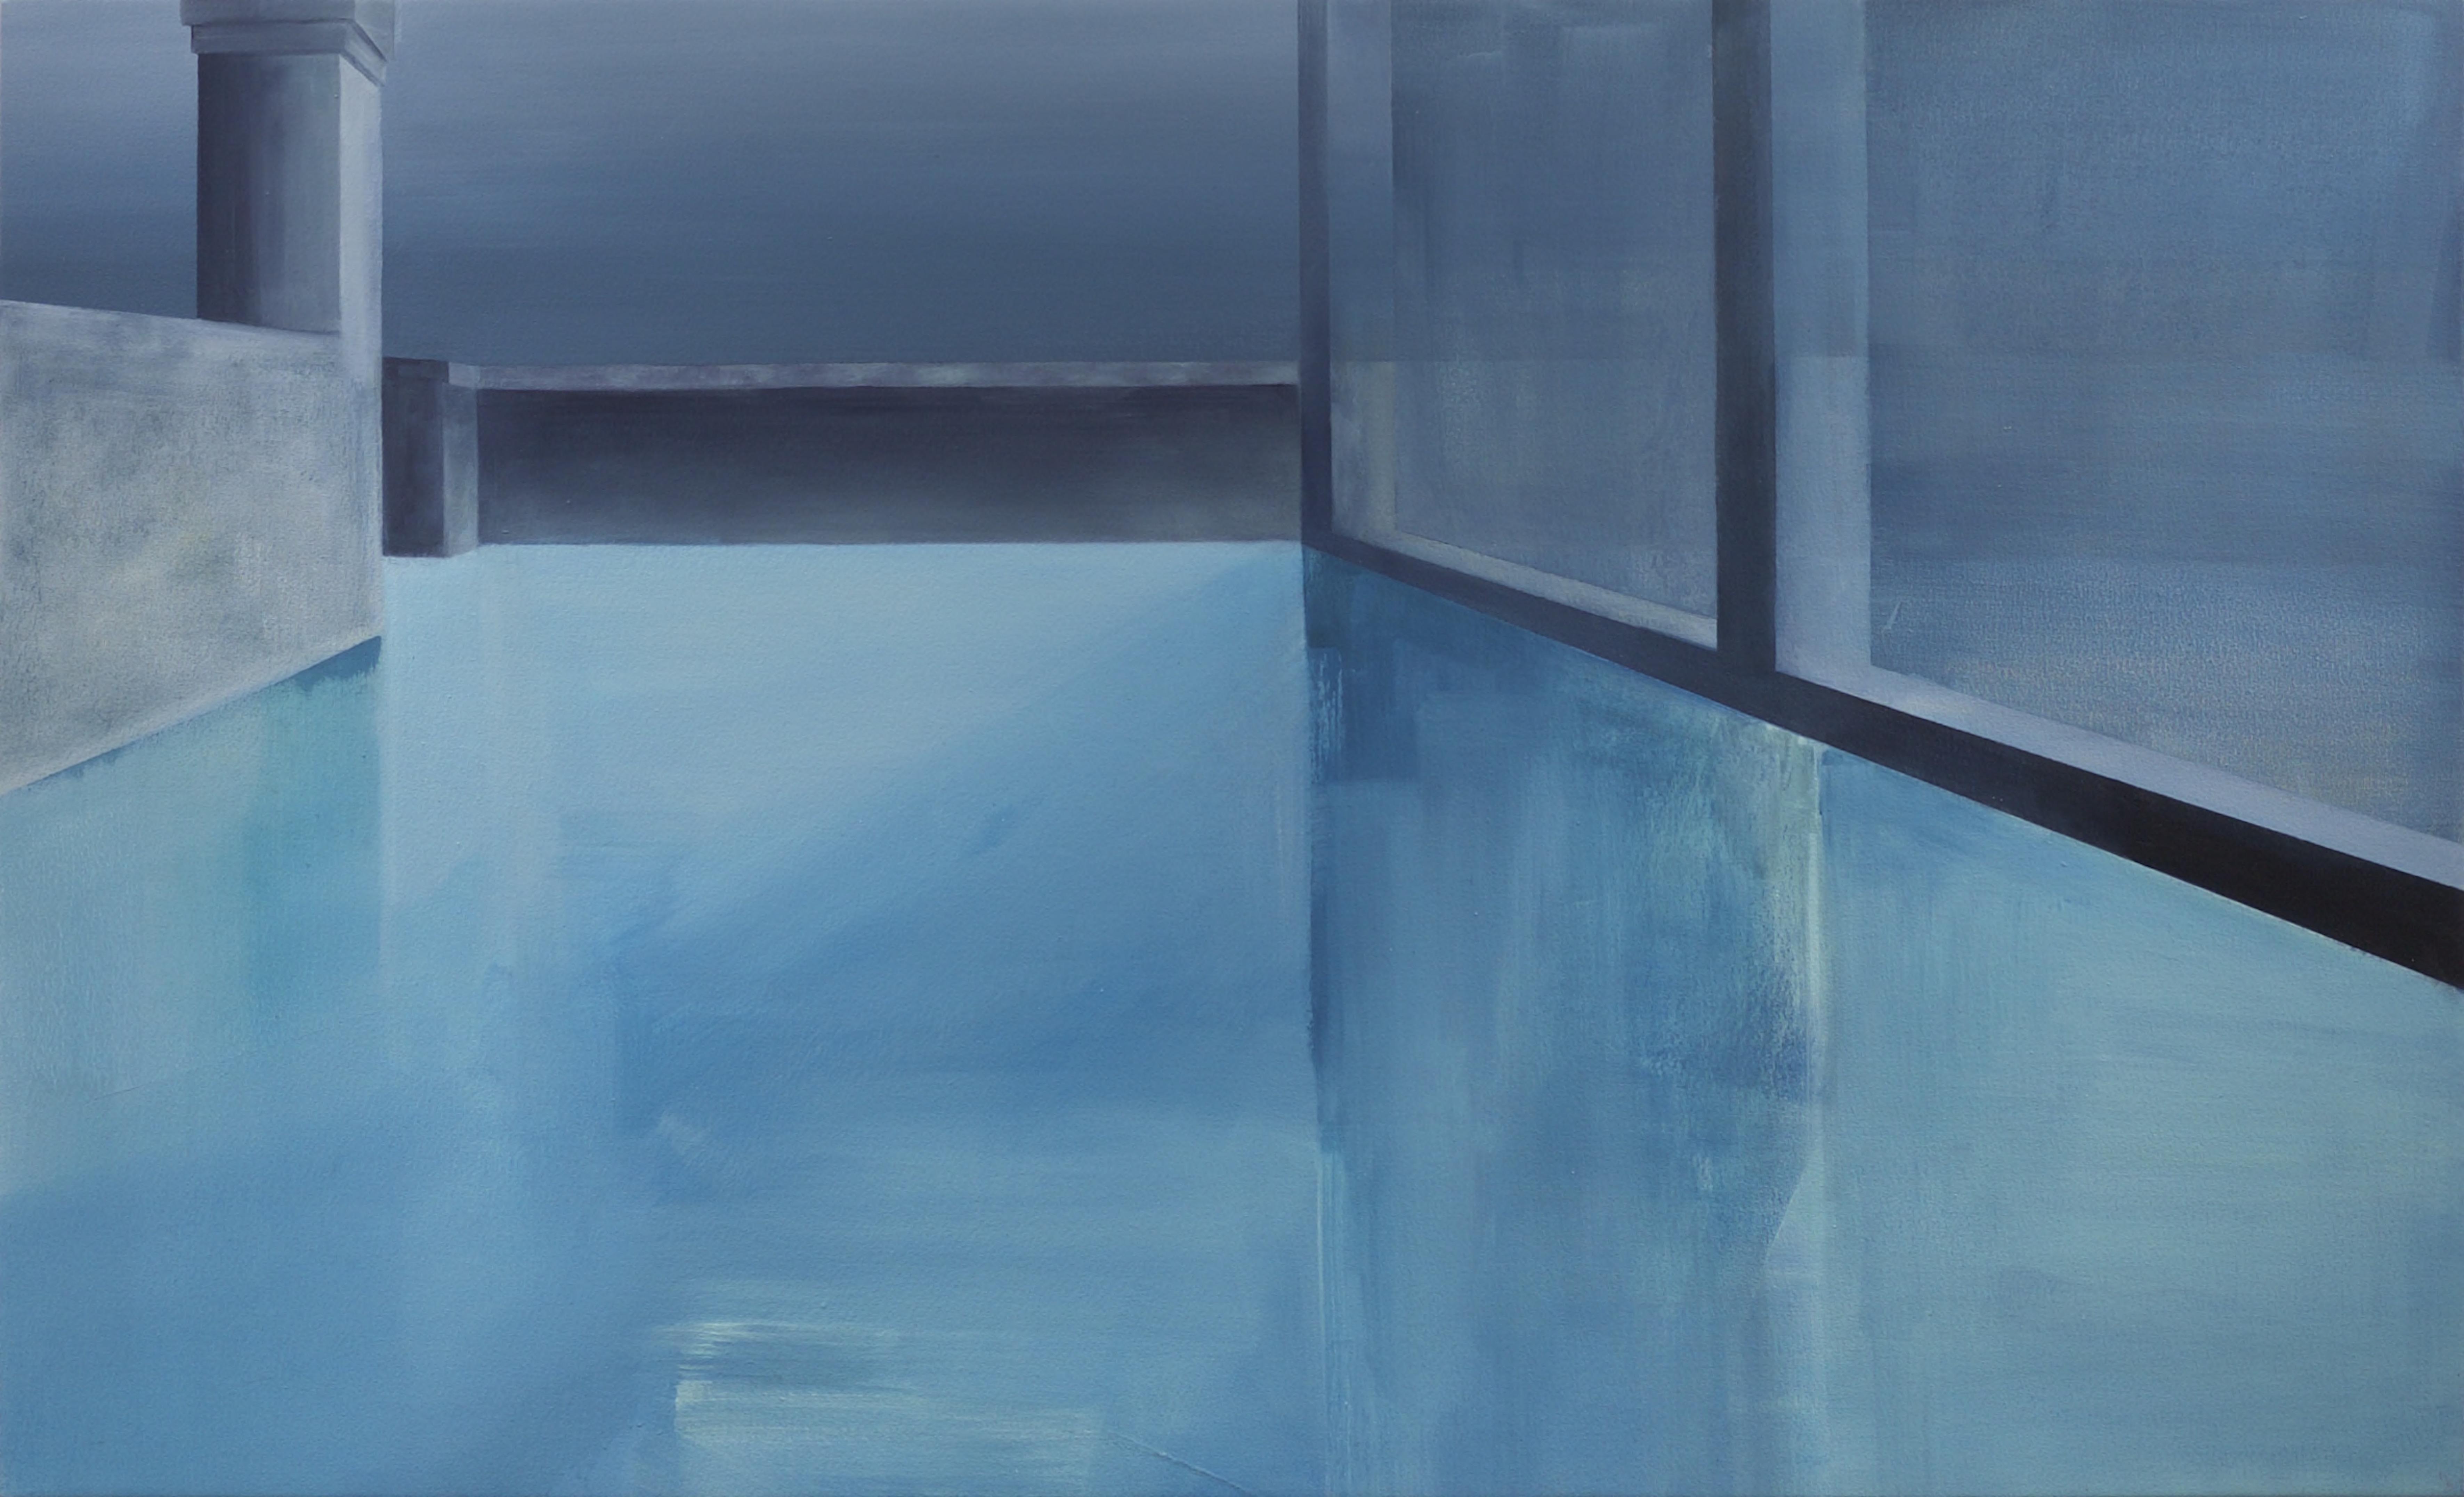 Fiona Harman, 2015. Lost Horizon, oil on canvas, 80 x 130cm